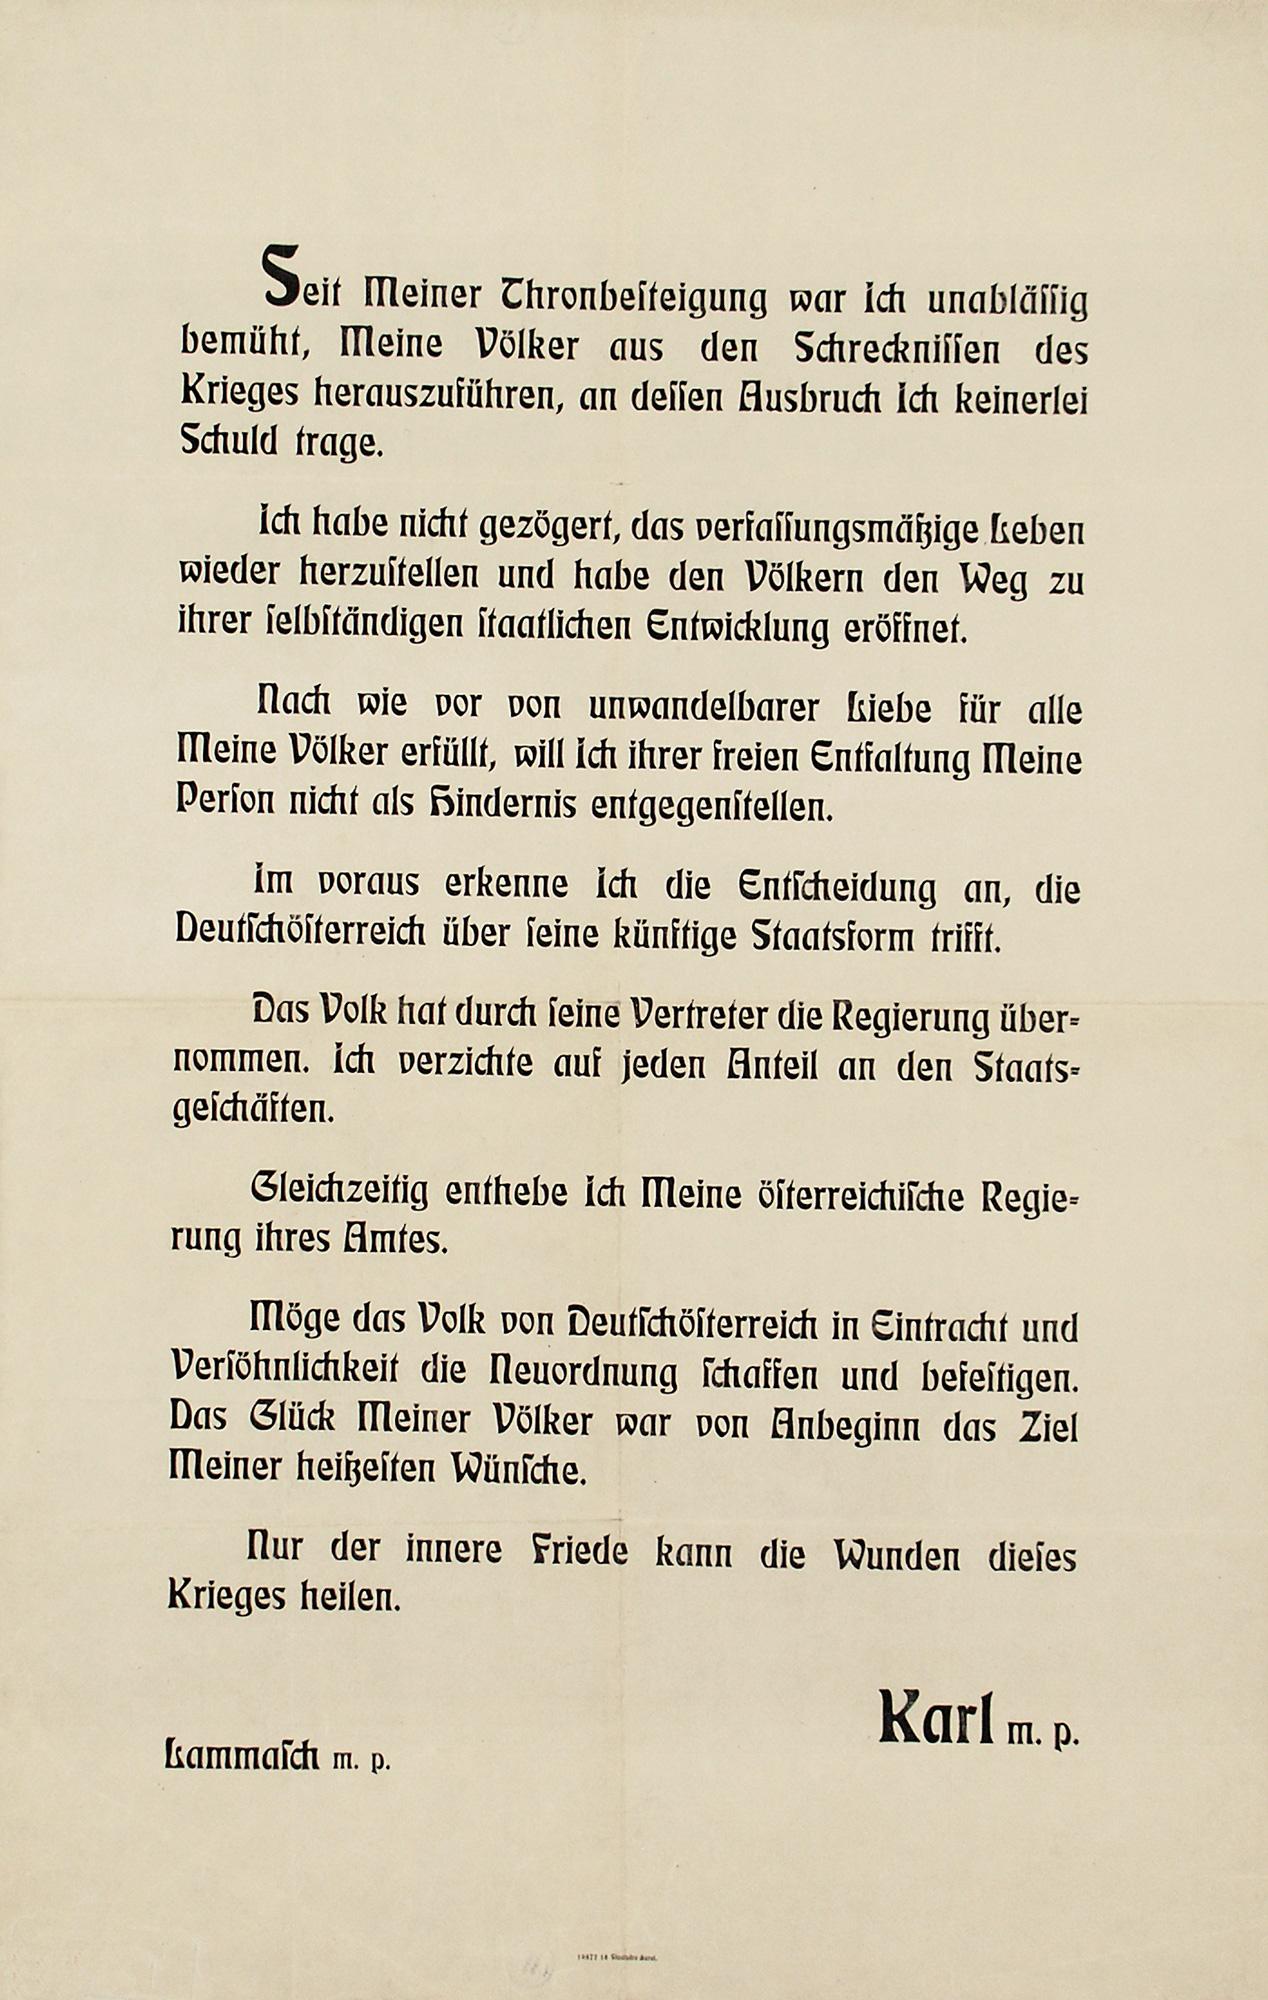 Emperor Karl's abdication - proclamation